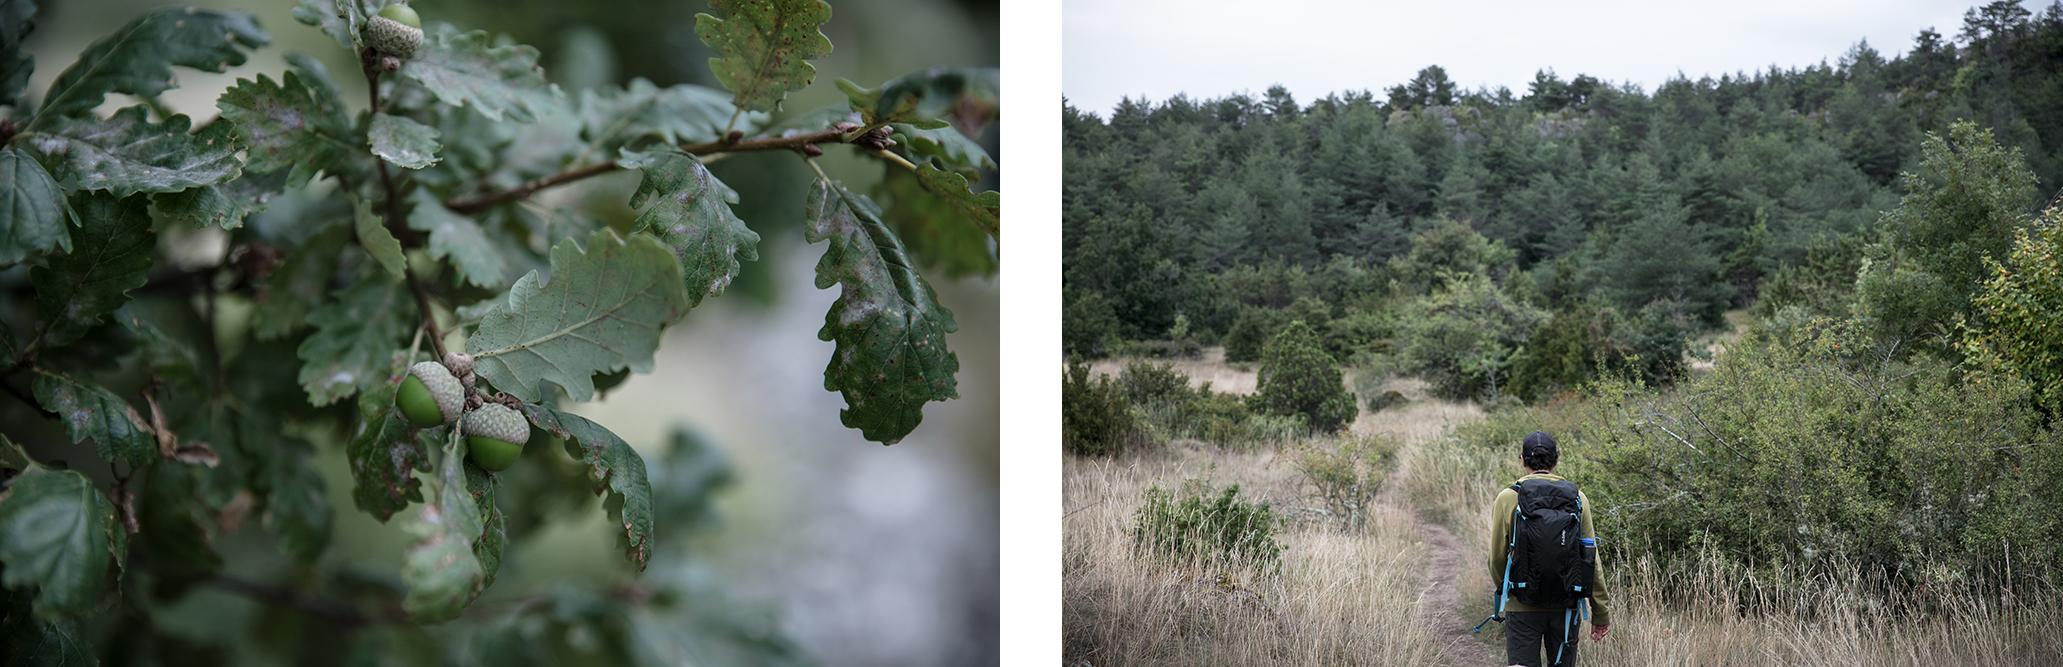 randonnée nature en Aveyron